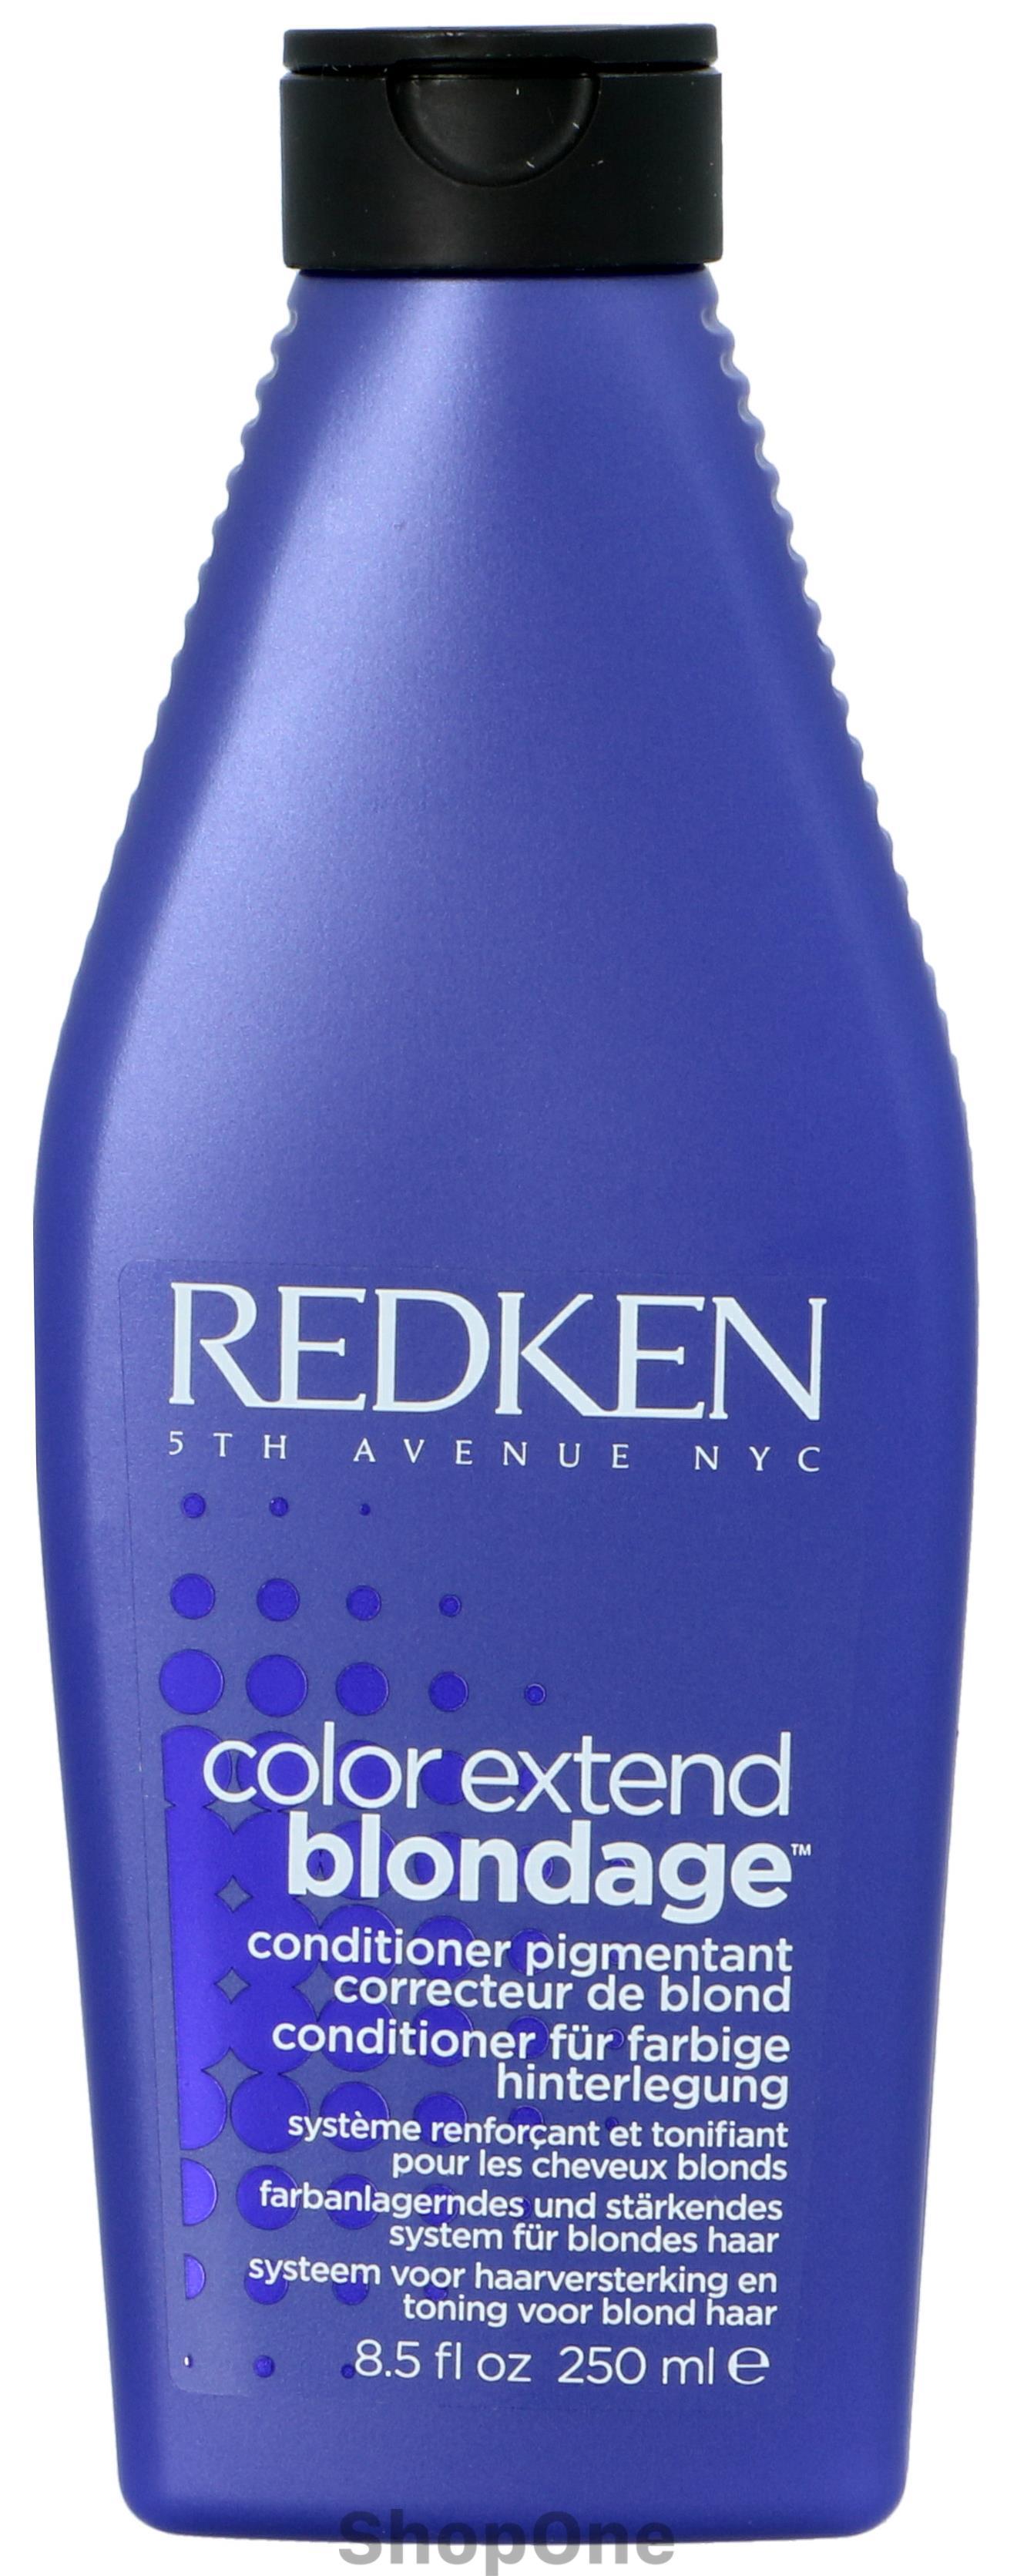 Color Extend Blondage Conditioner 250 ml fra Redken - Haarverzorging Redken Color Extend Blondage Conditioner 250 ml. Fra Redken.